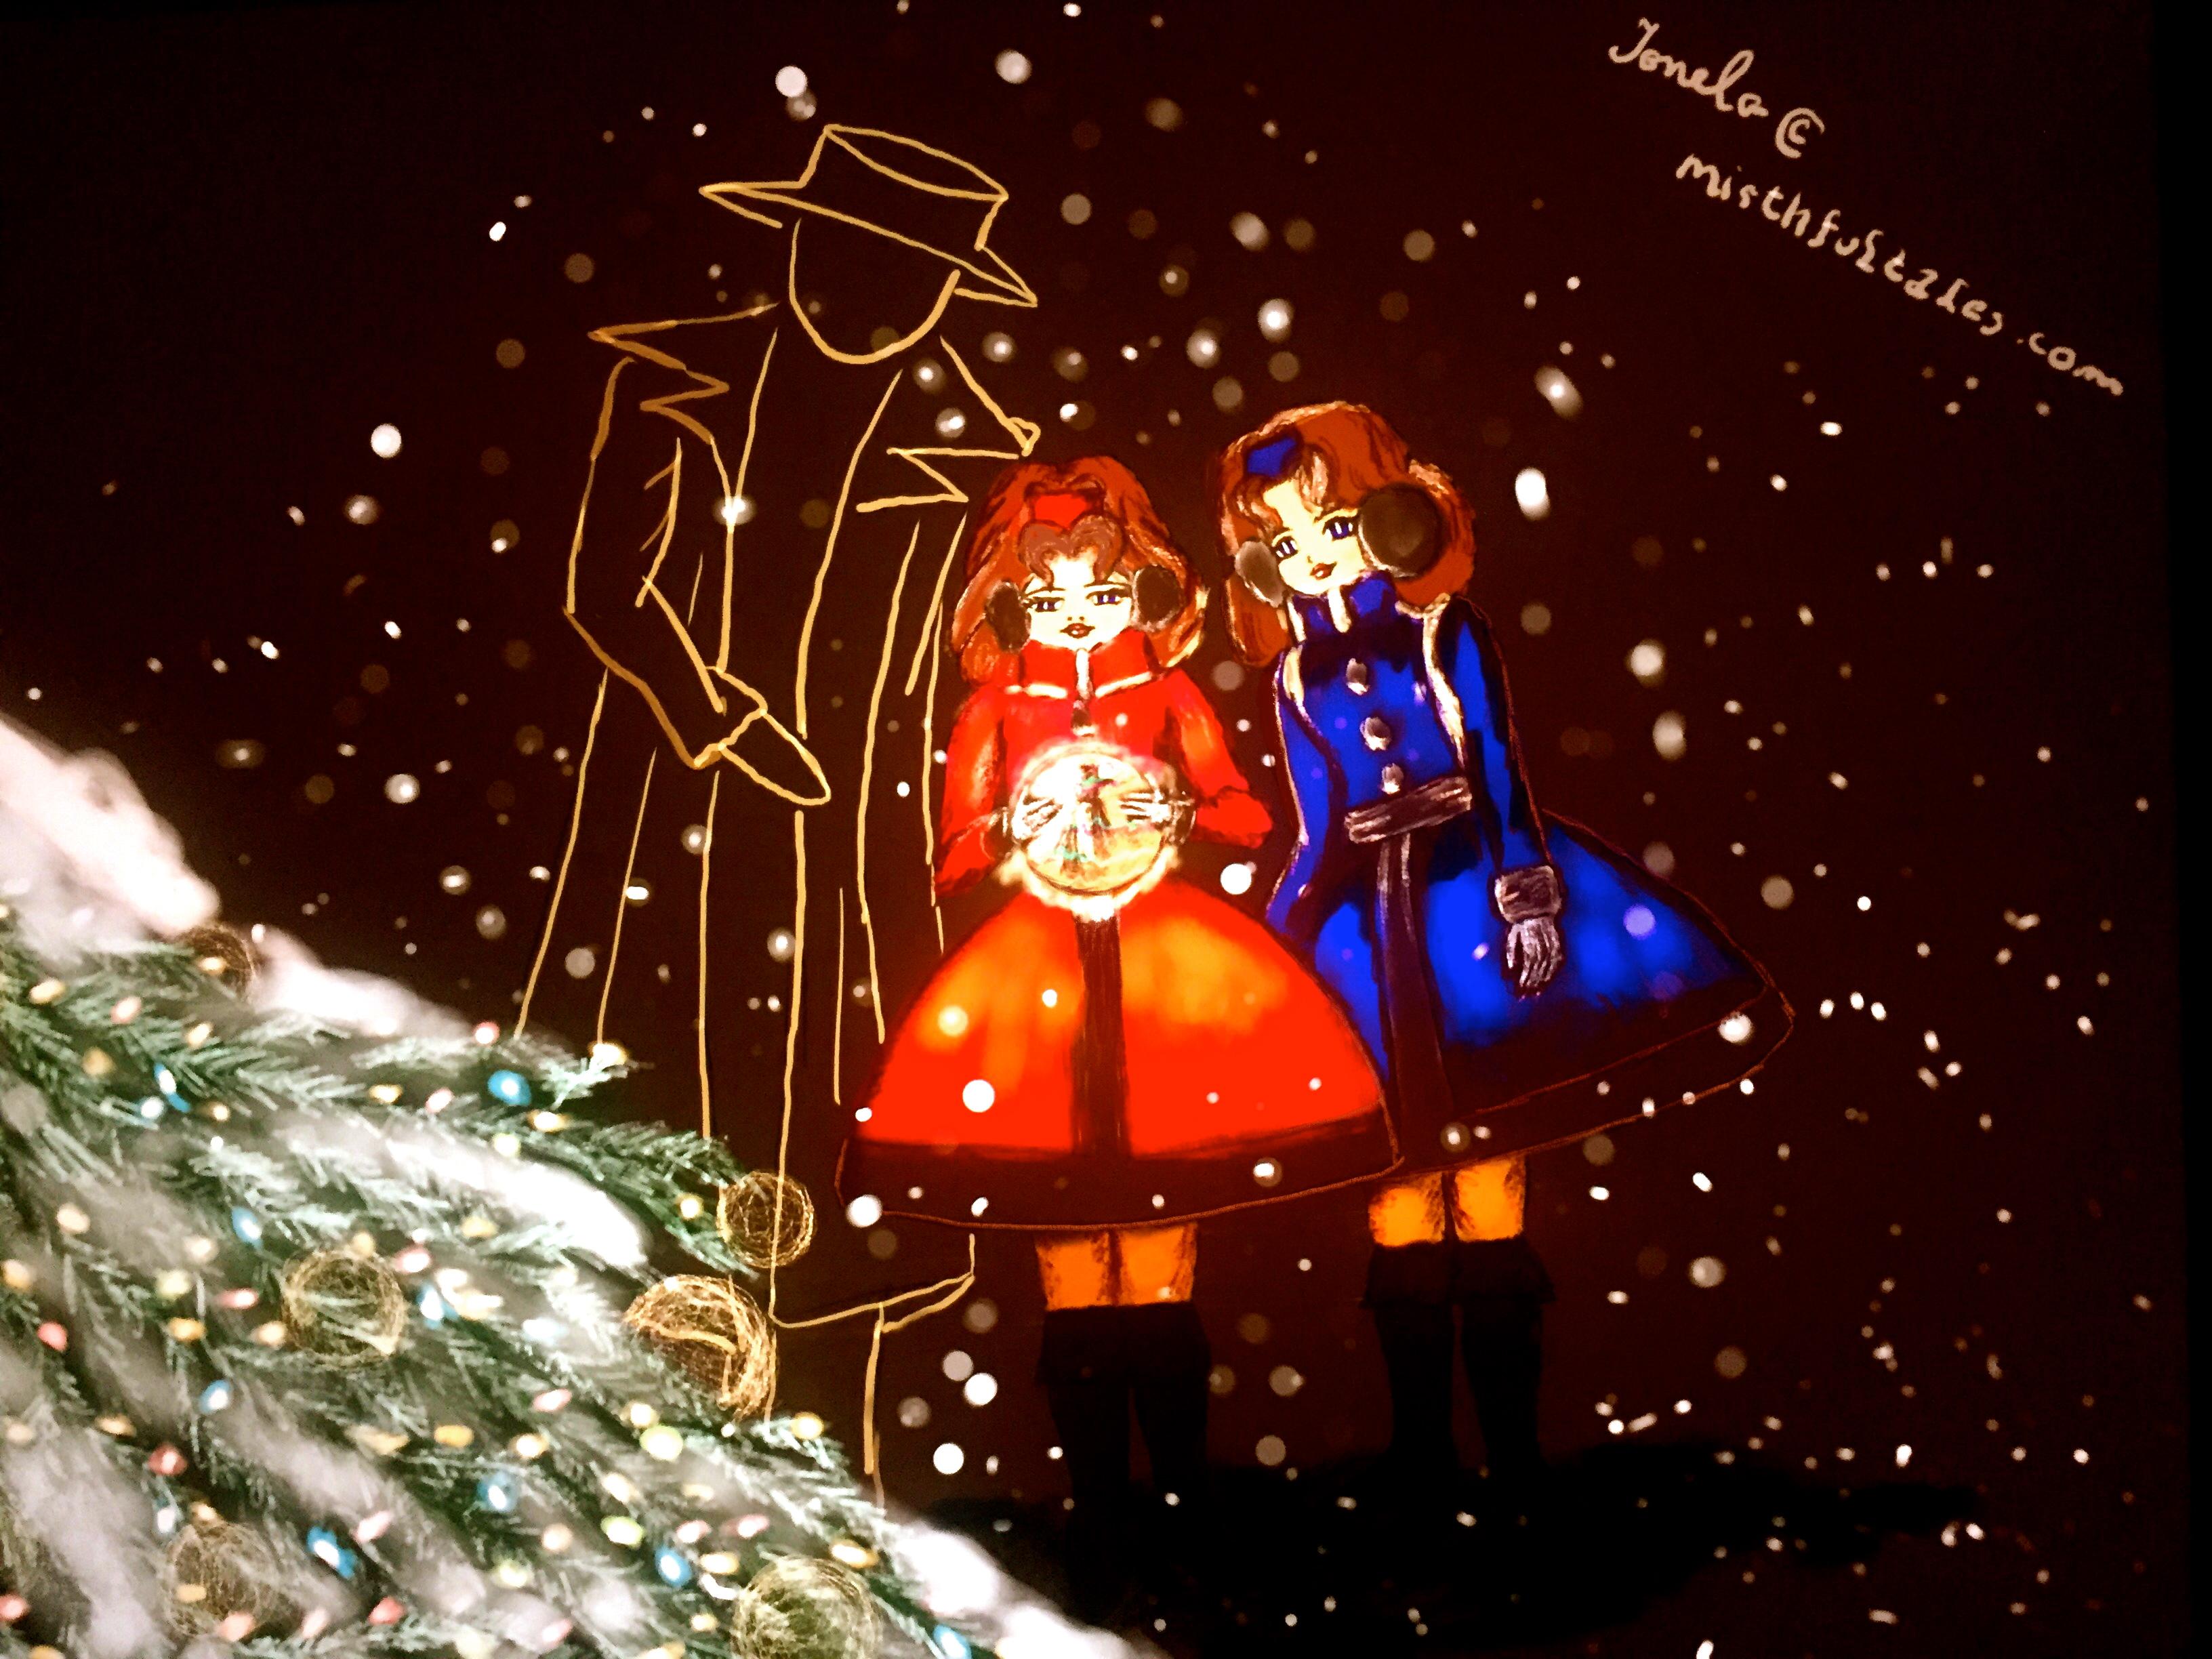 mirthfultales.com. Tina and Ella. Christmas. New Fairy Tales. Magic